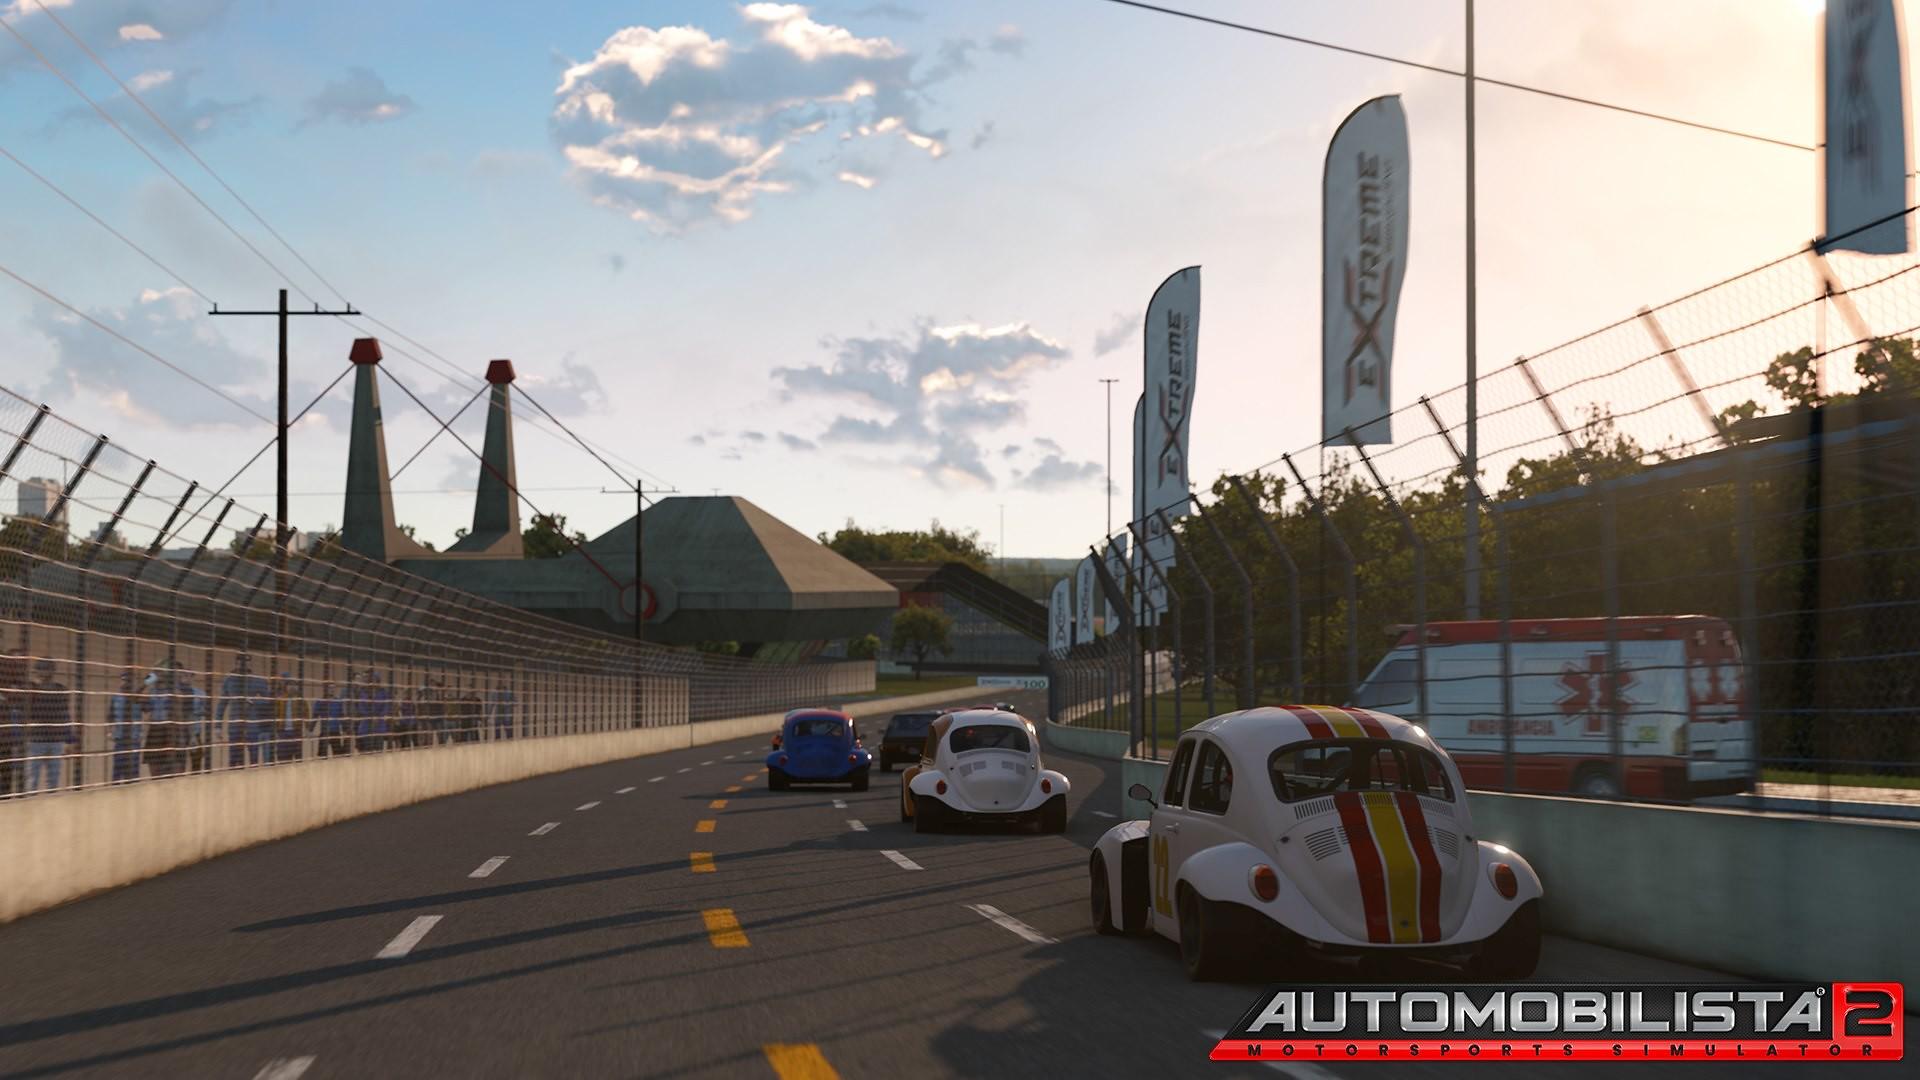 3 Automobilista 2 - Update V1.2.2.0